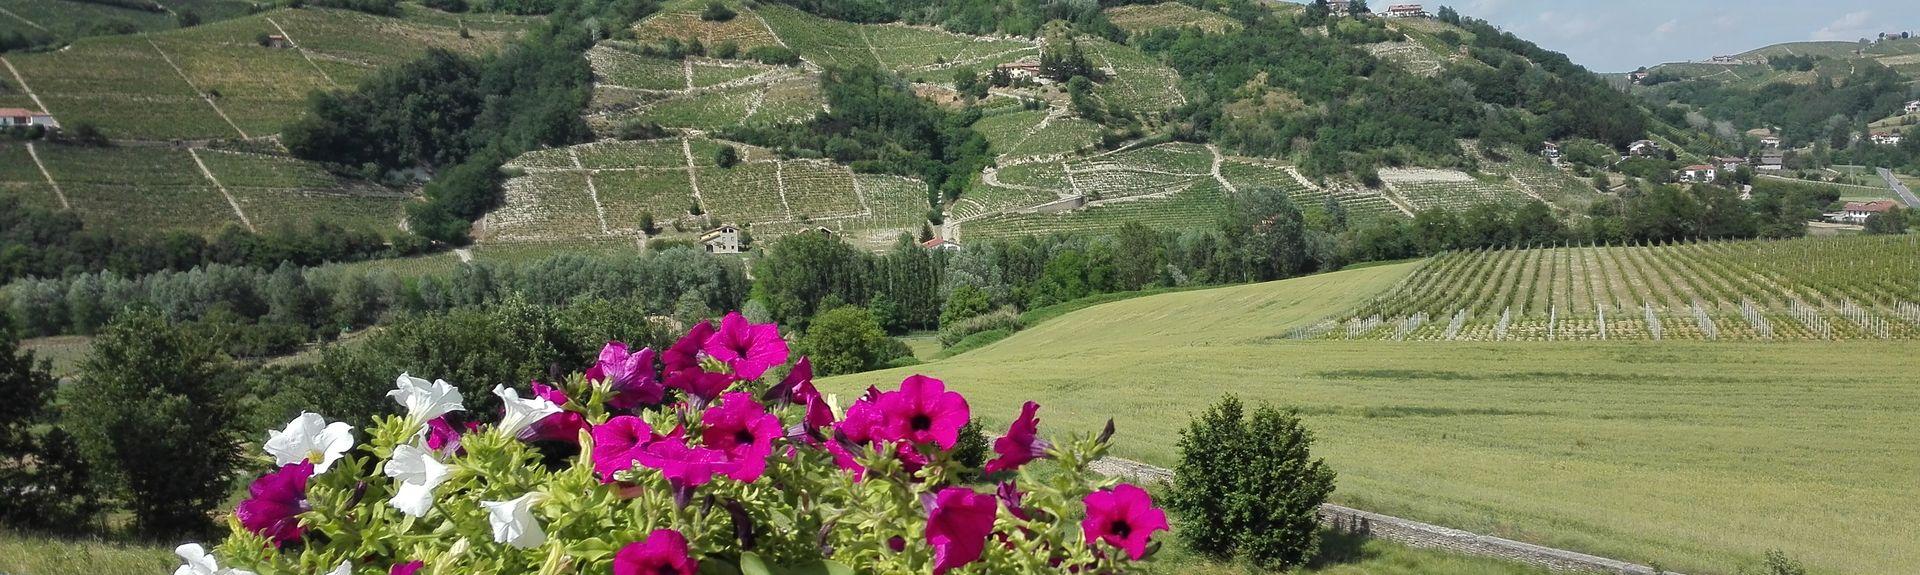 Castino, Cuneo, Piedmont, Italy